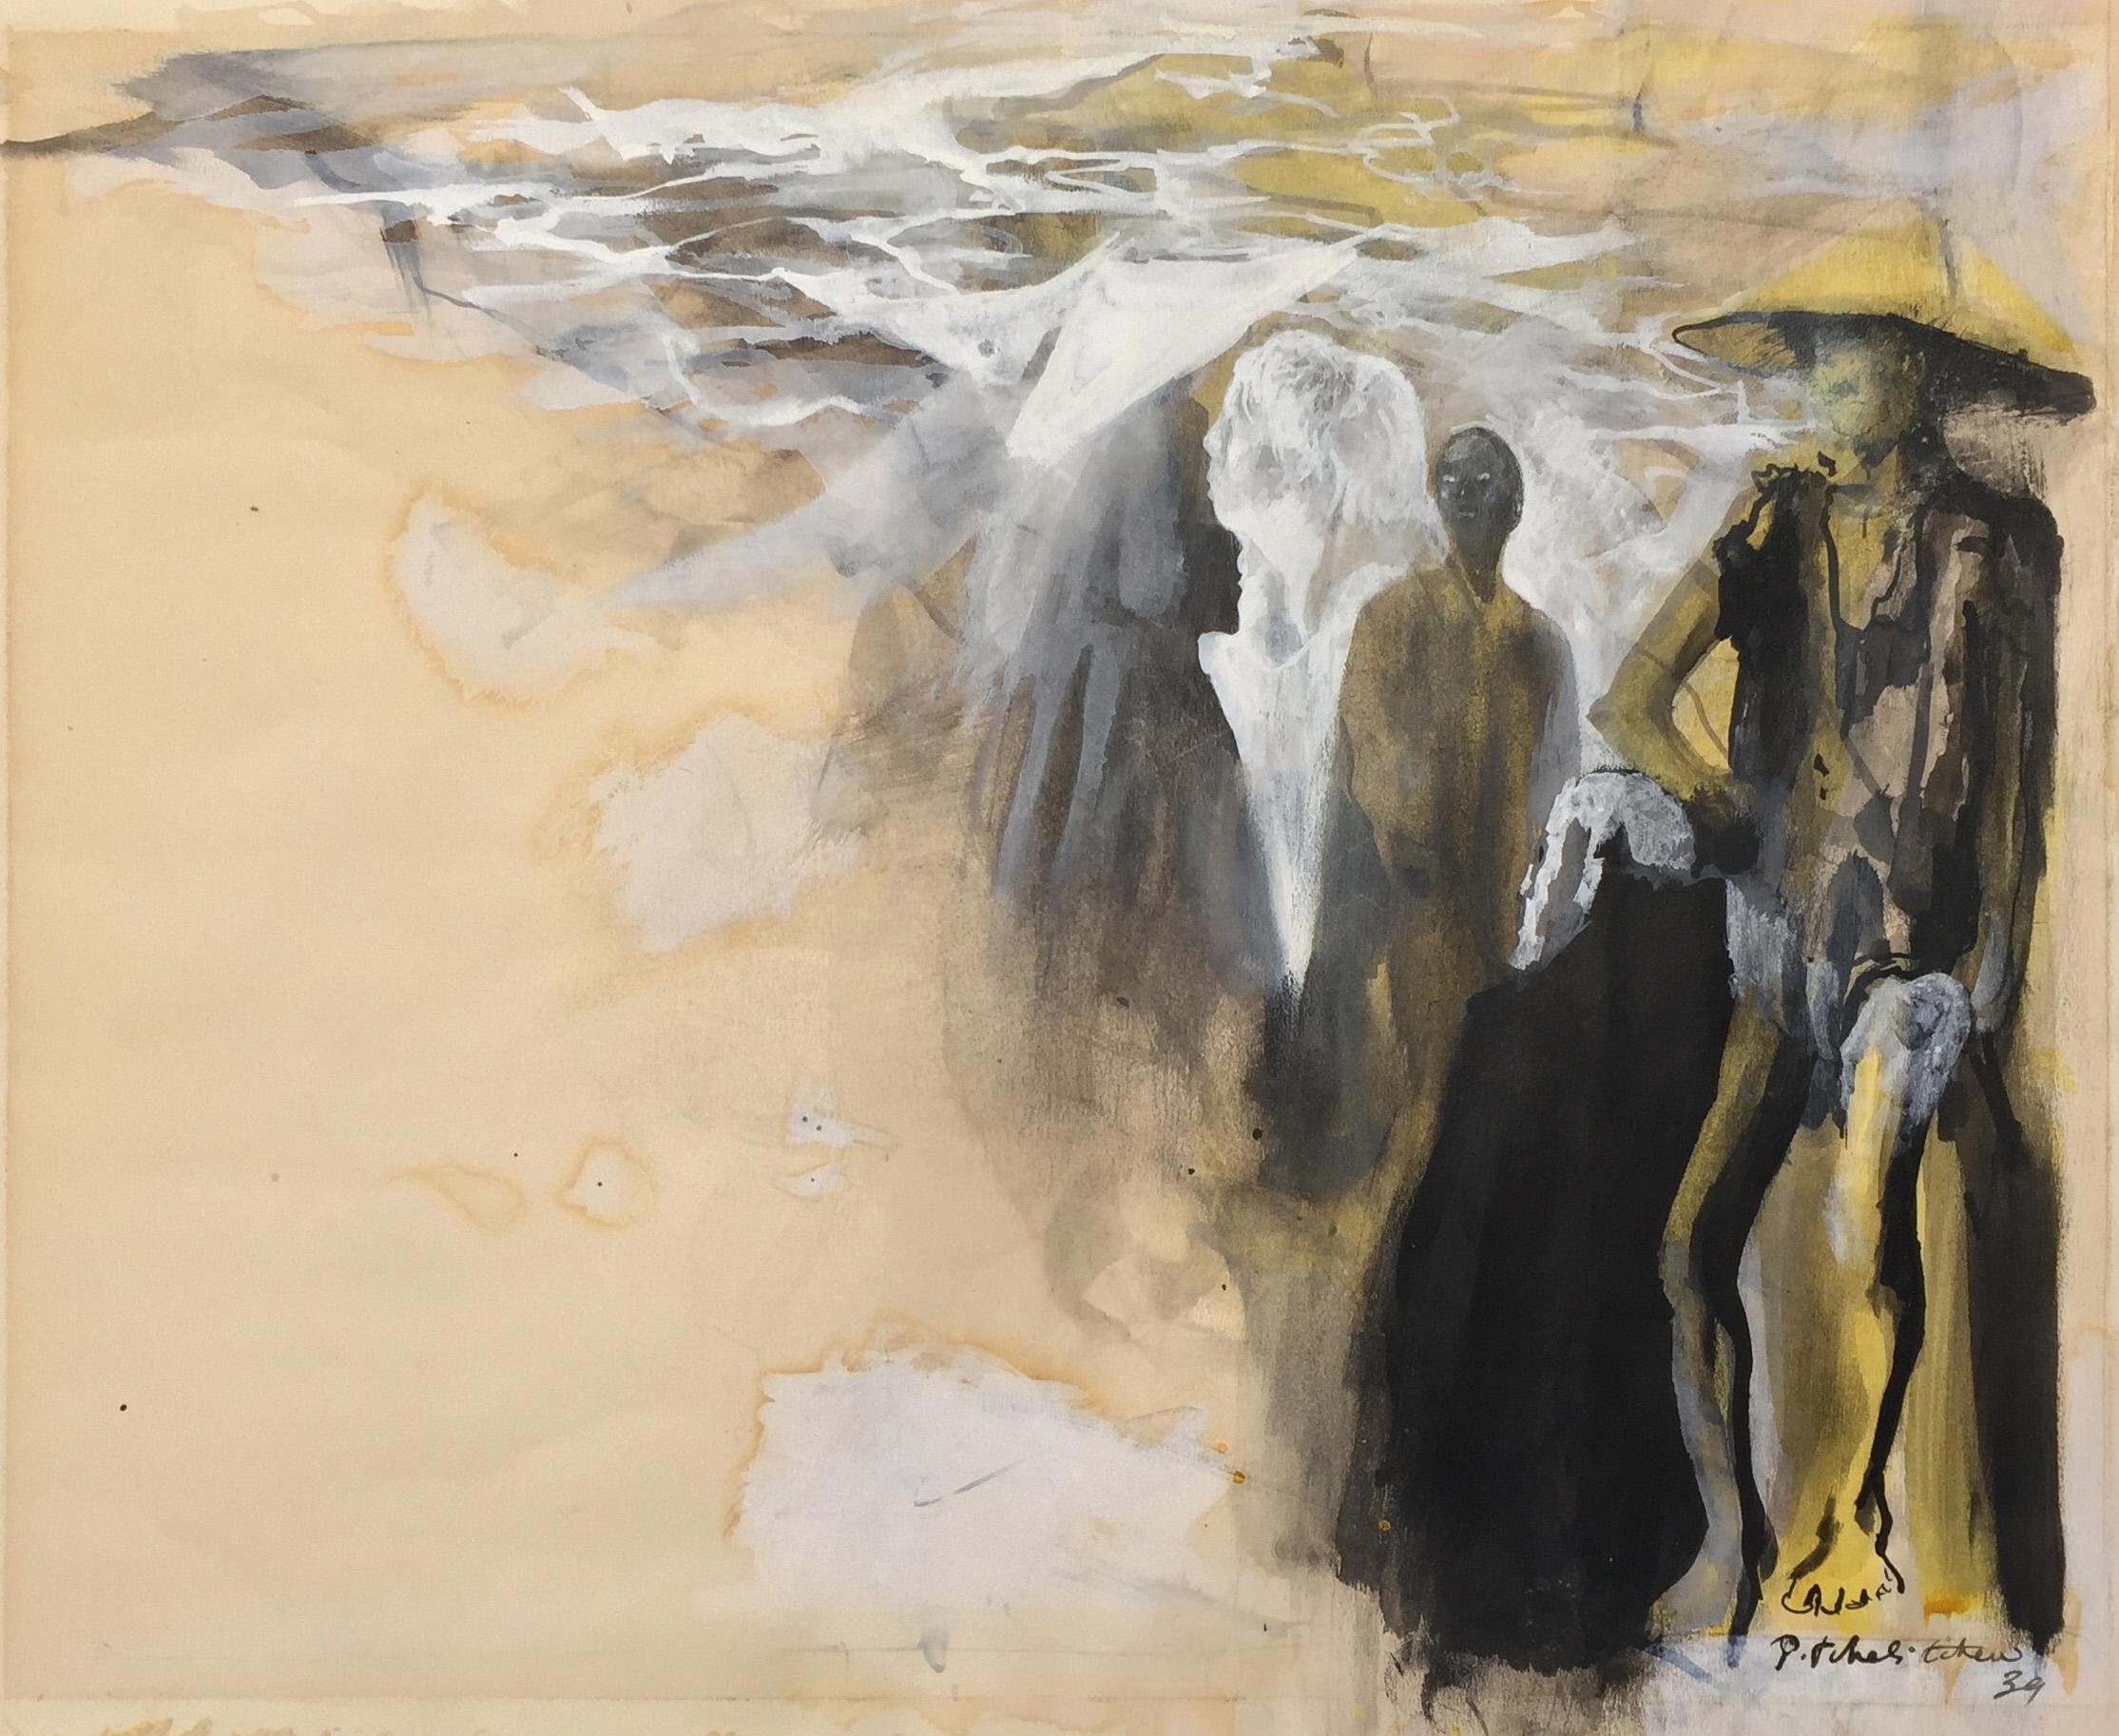 Pavel Tchelitche: Eastern figures